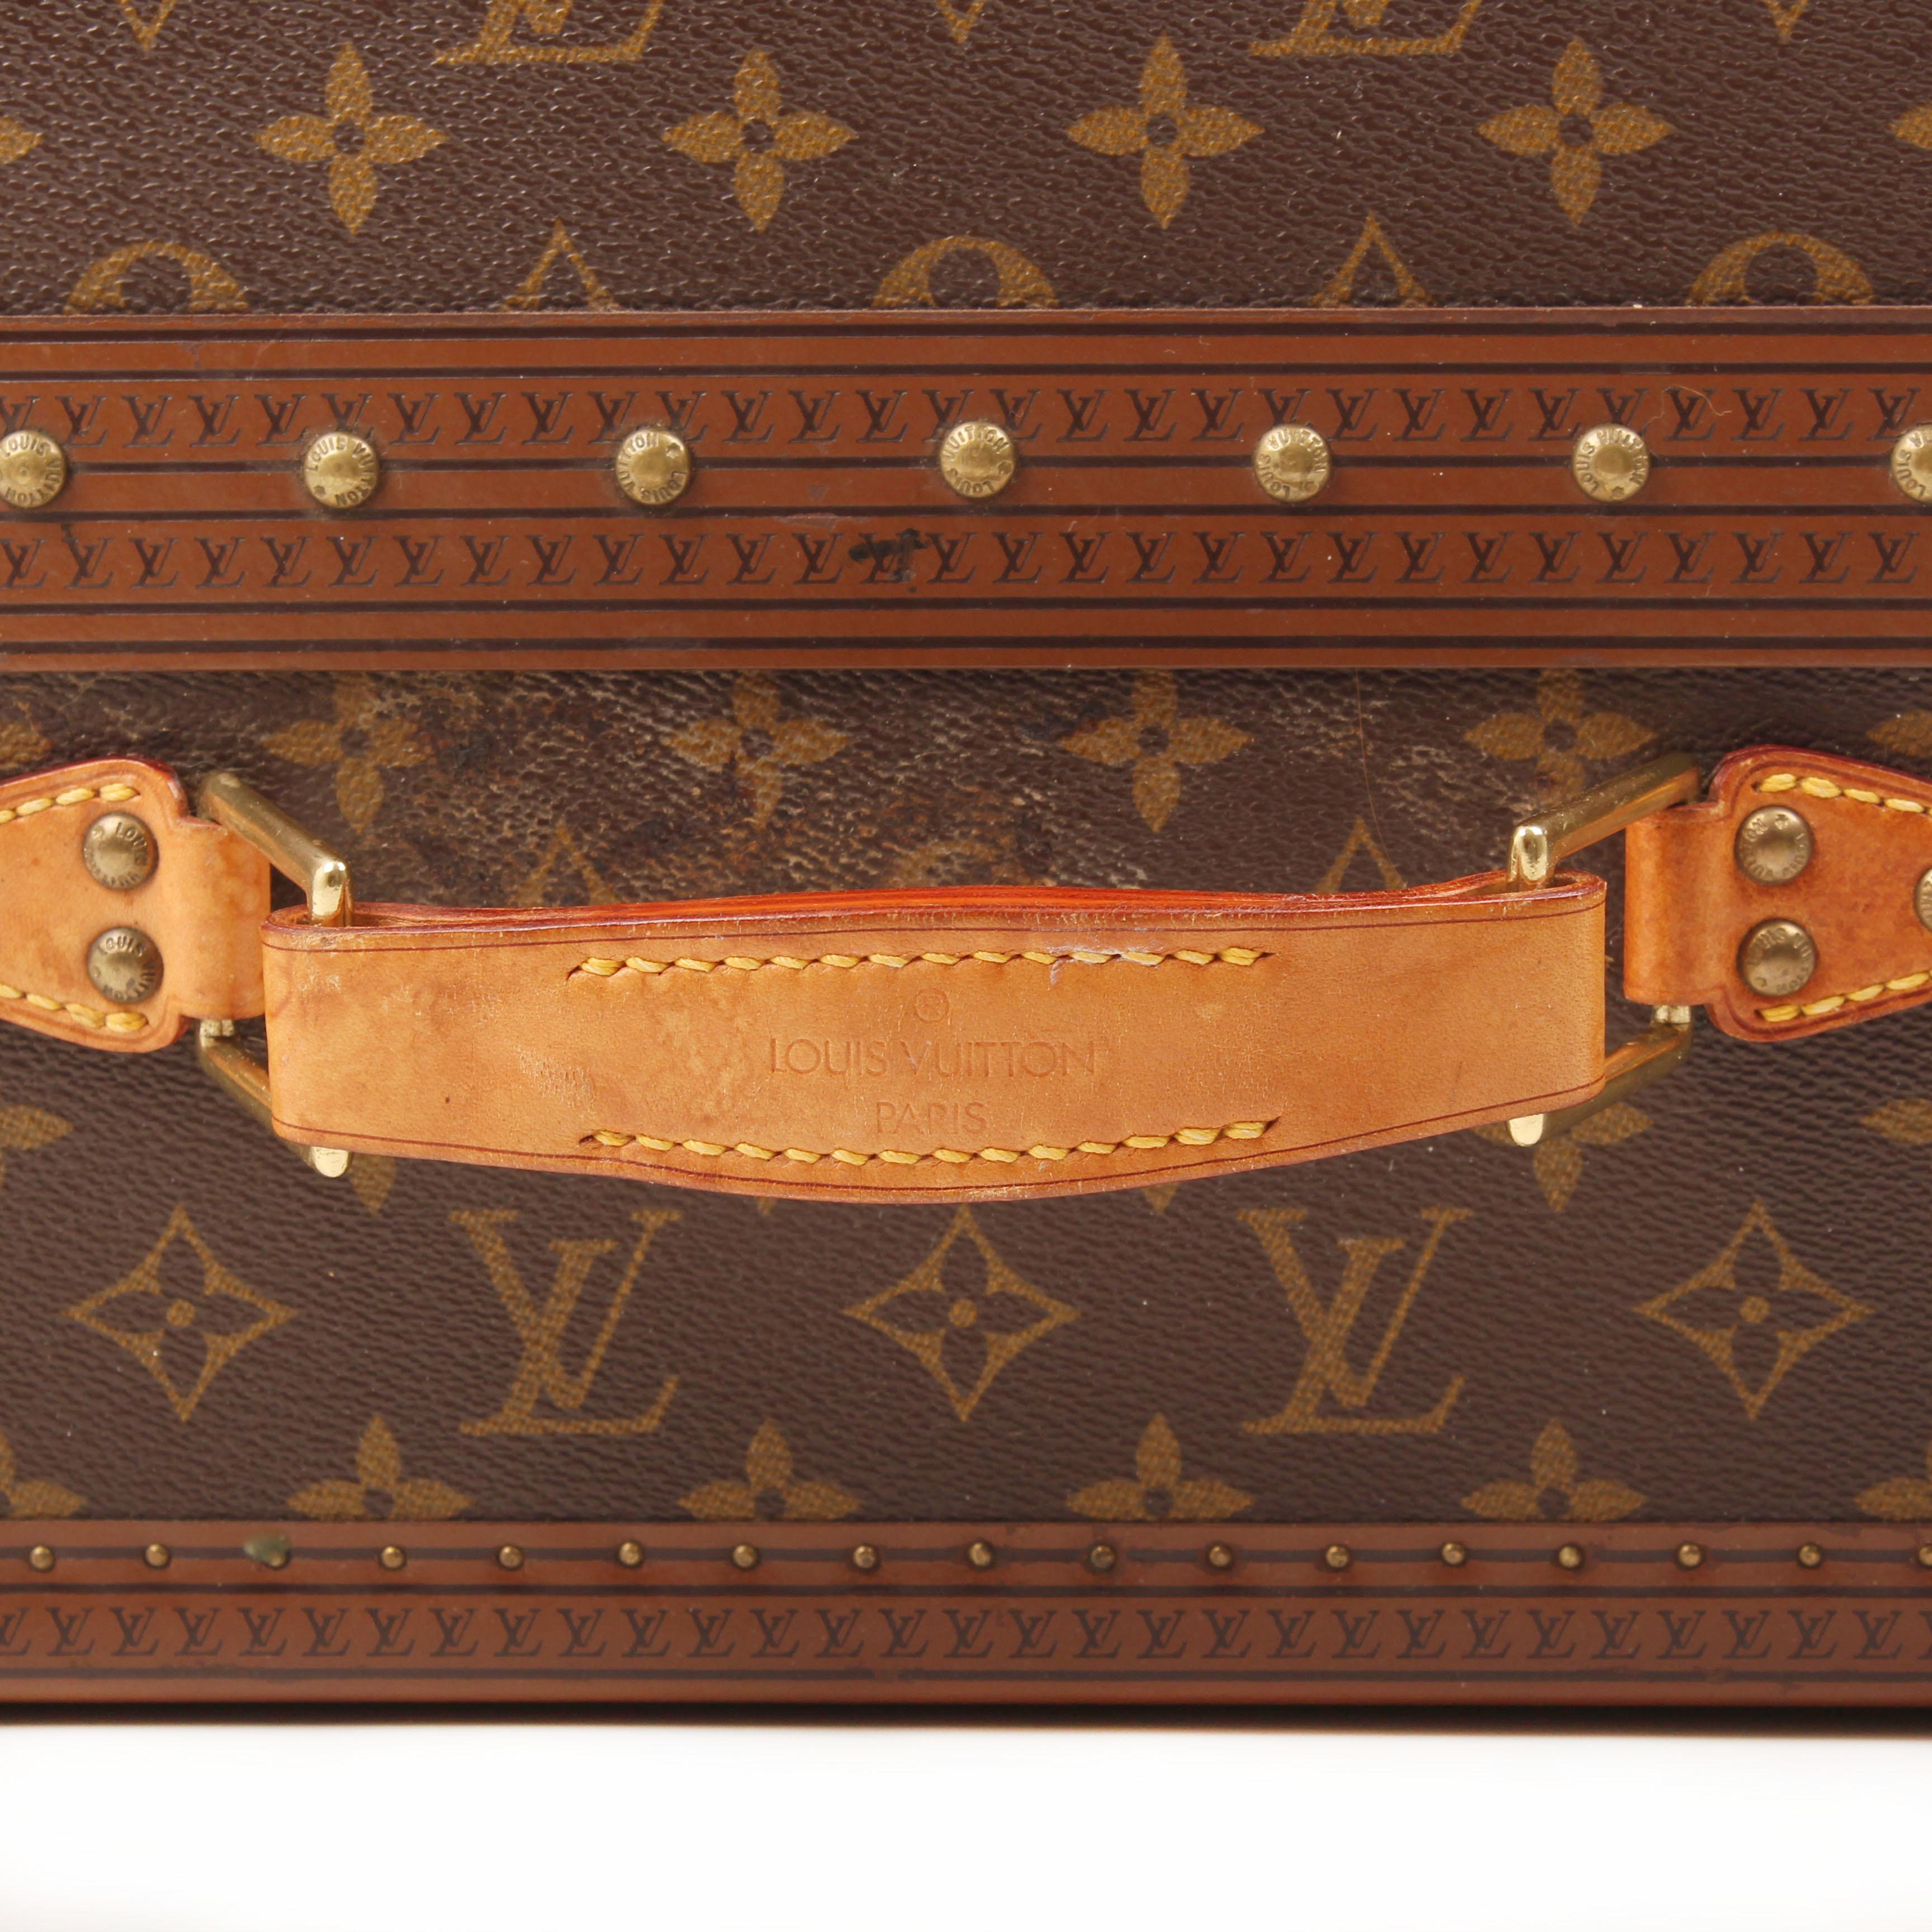 louis vuitton gemine shoe trunk 12 pairs monogram handle